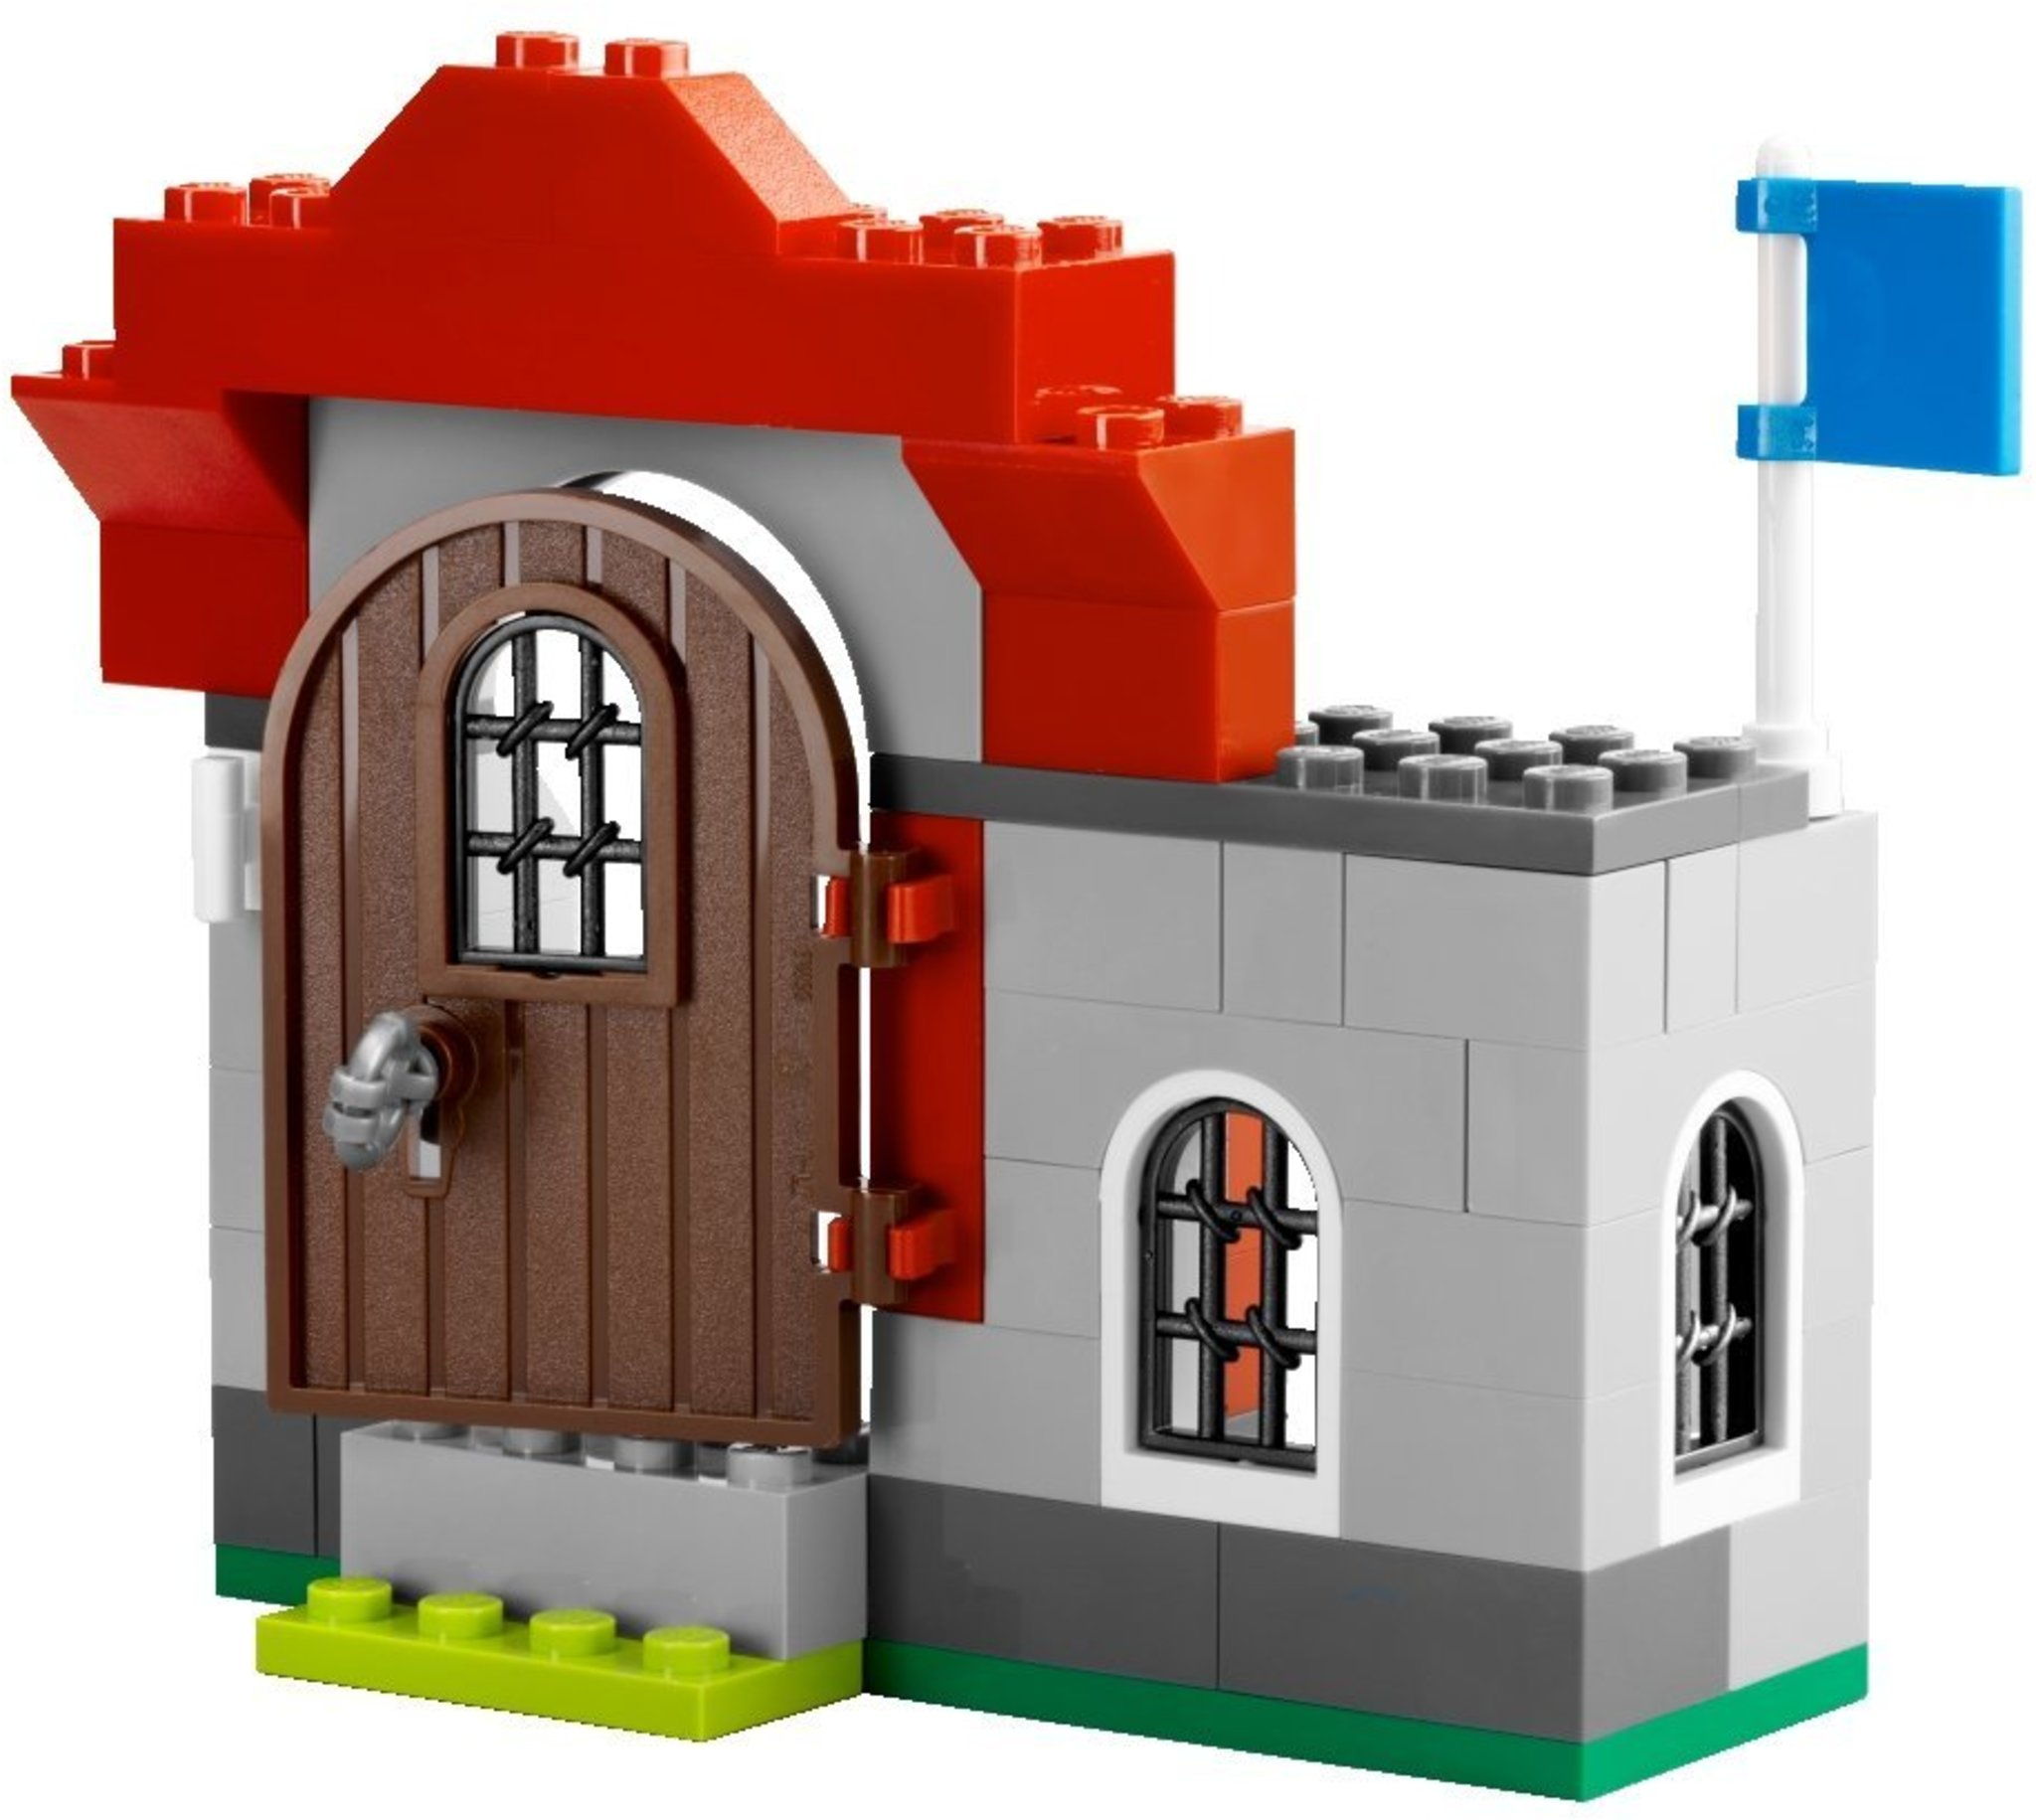 Lego Bricks And More 5929 Knight And Castle Building Set Mattonito